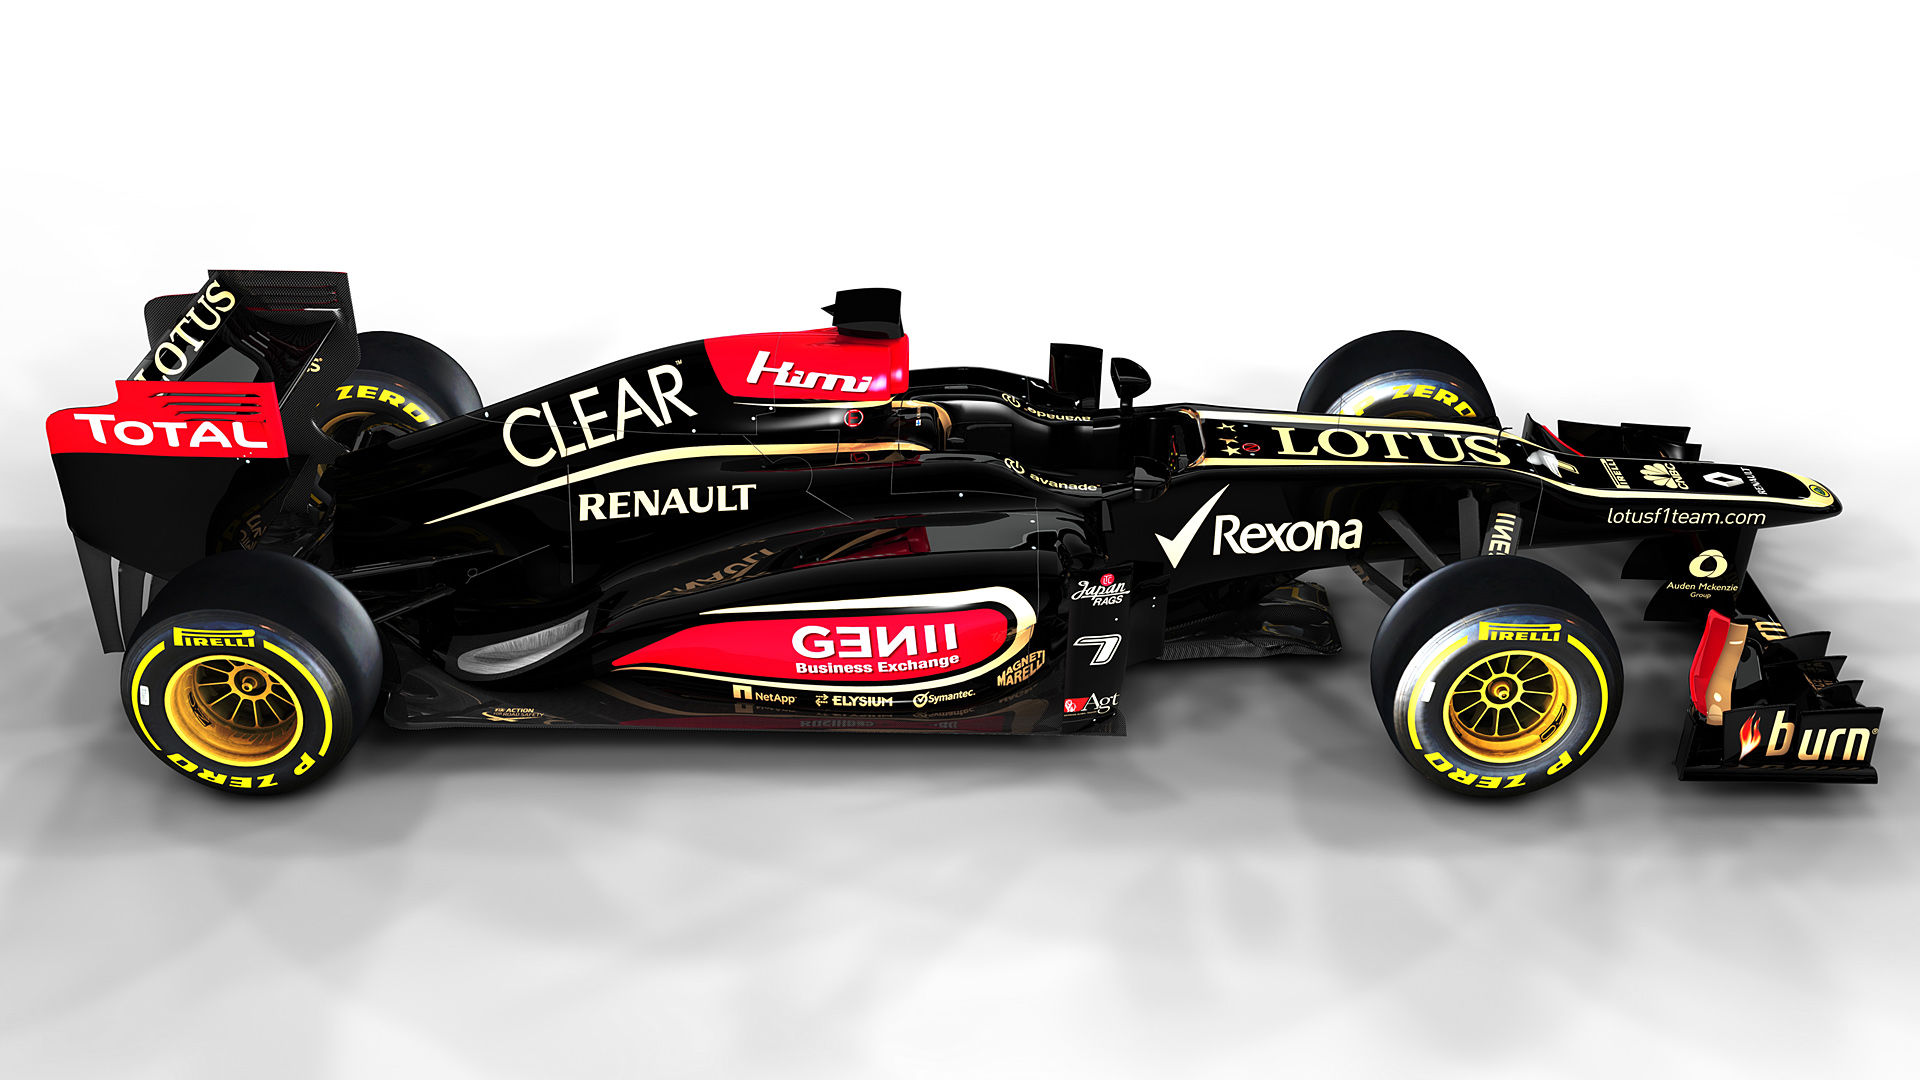 2013 Lotus Renault F1 E21